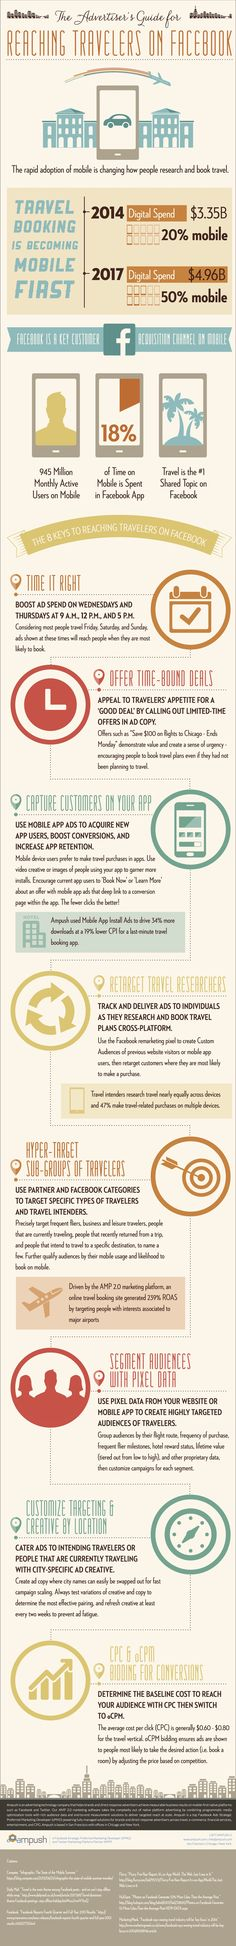 INFOGRAPHIC: Reaching Travelers on Facebook - AllFacebook